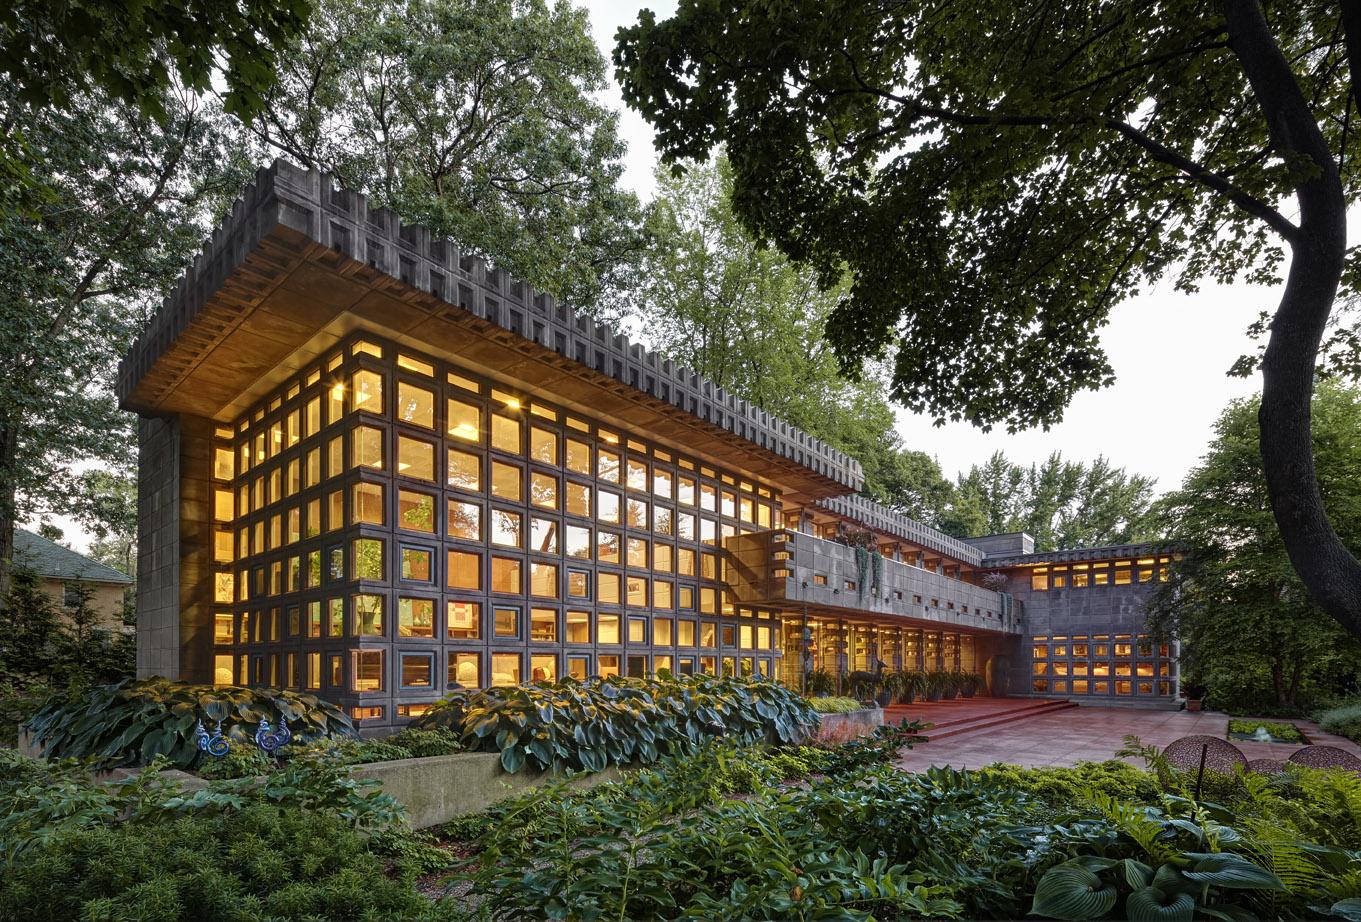 dorothy g turkel house frank lloyd wright architect rh turkelhouse com turkey houses to buy turkey house insurance